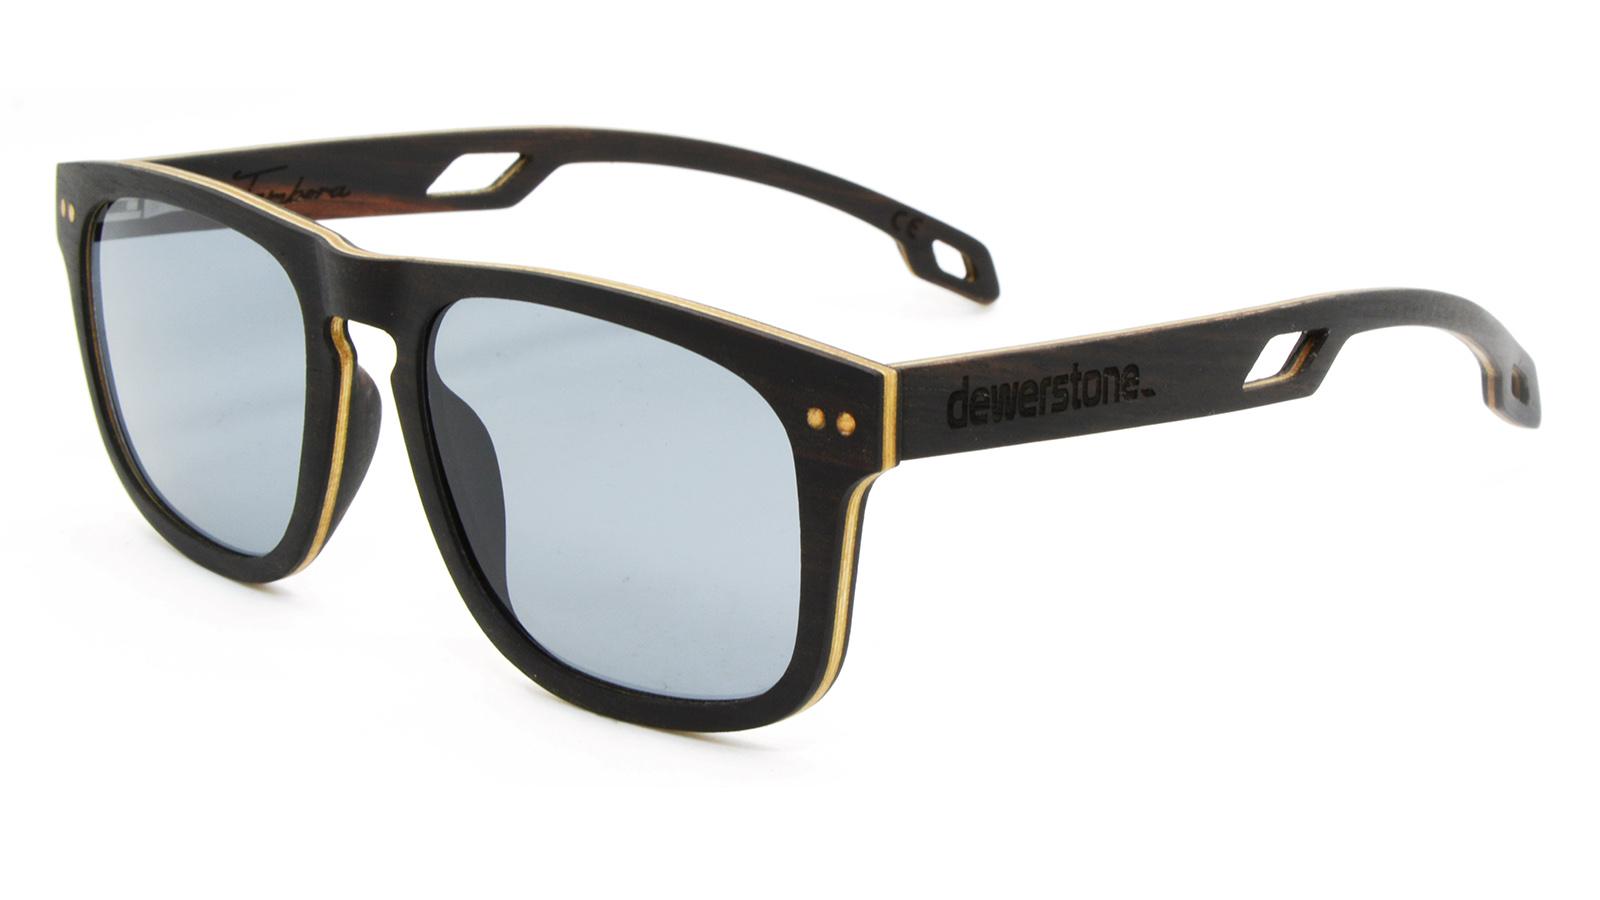 Dewerstone 2020 Sunglasses